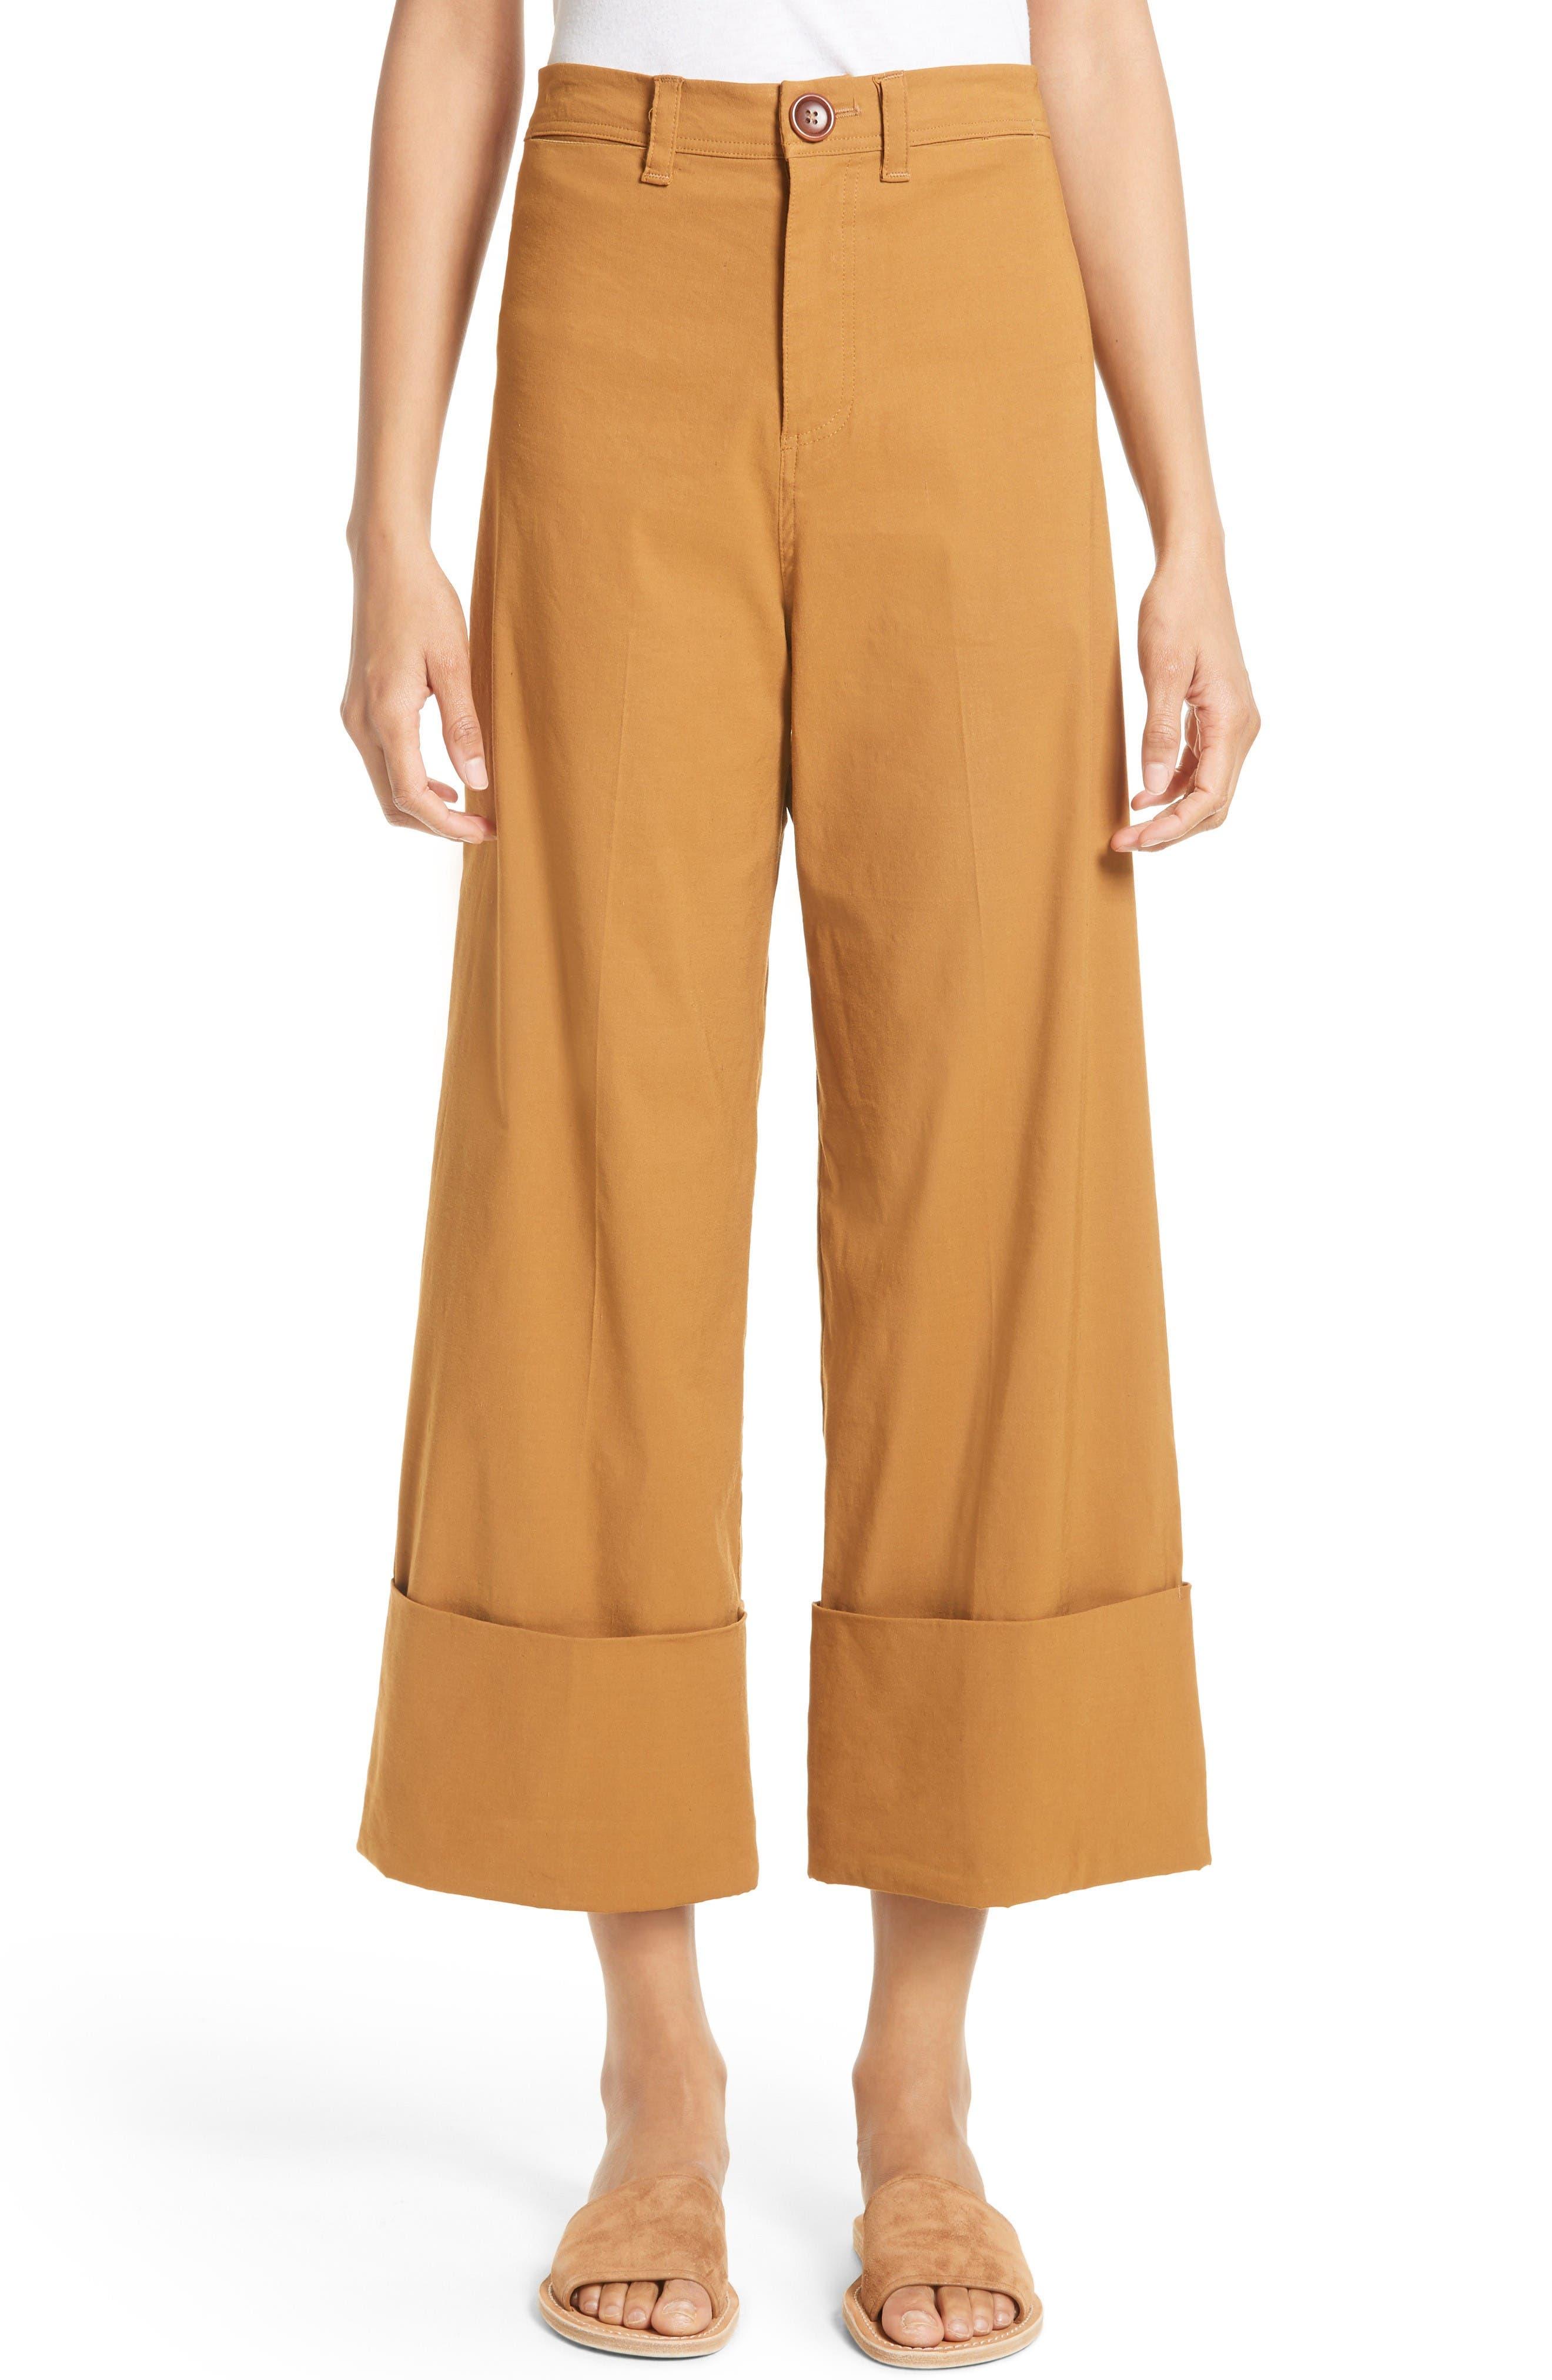 Alternate Image 1 Selected - Sea Cuffed Crop Pants